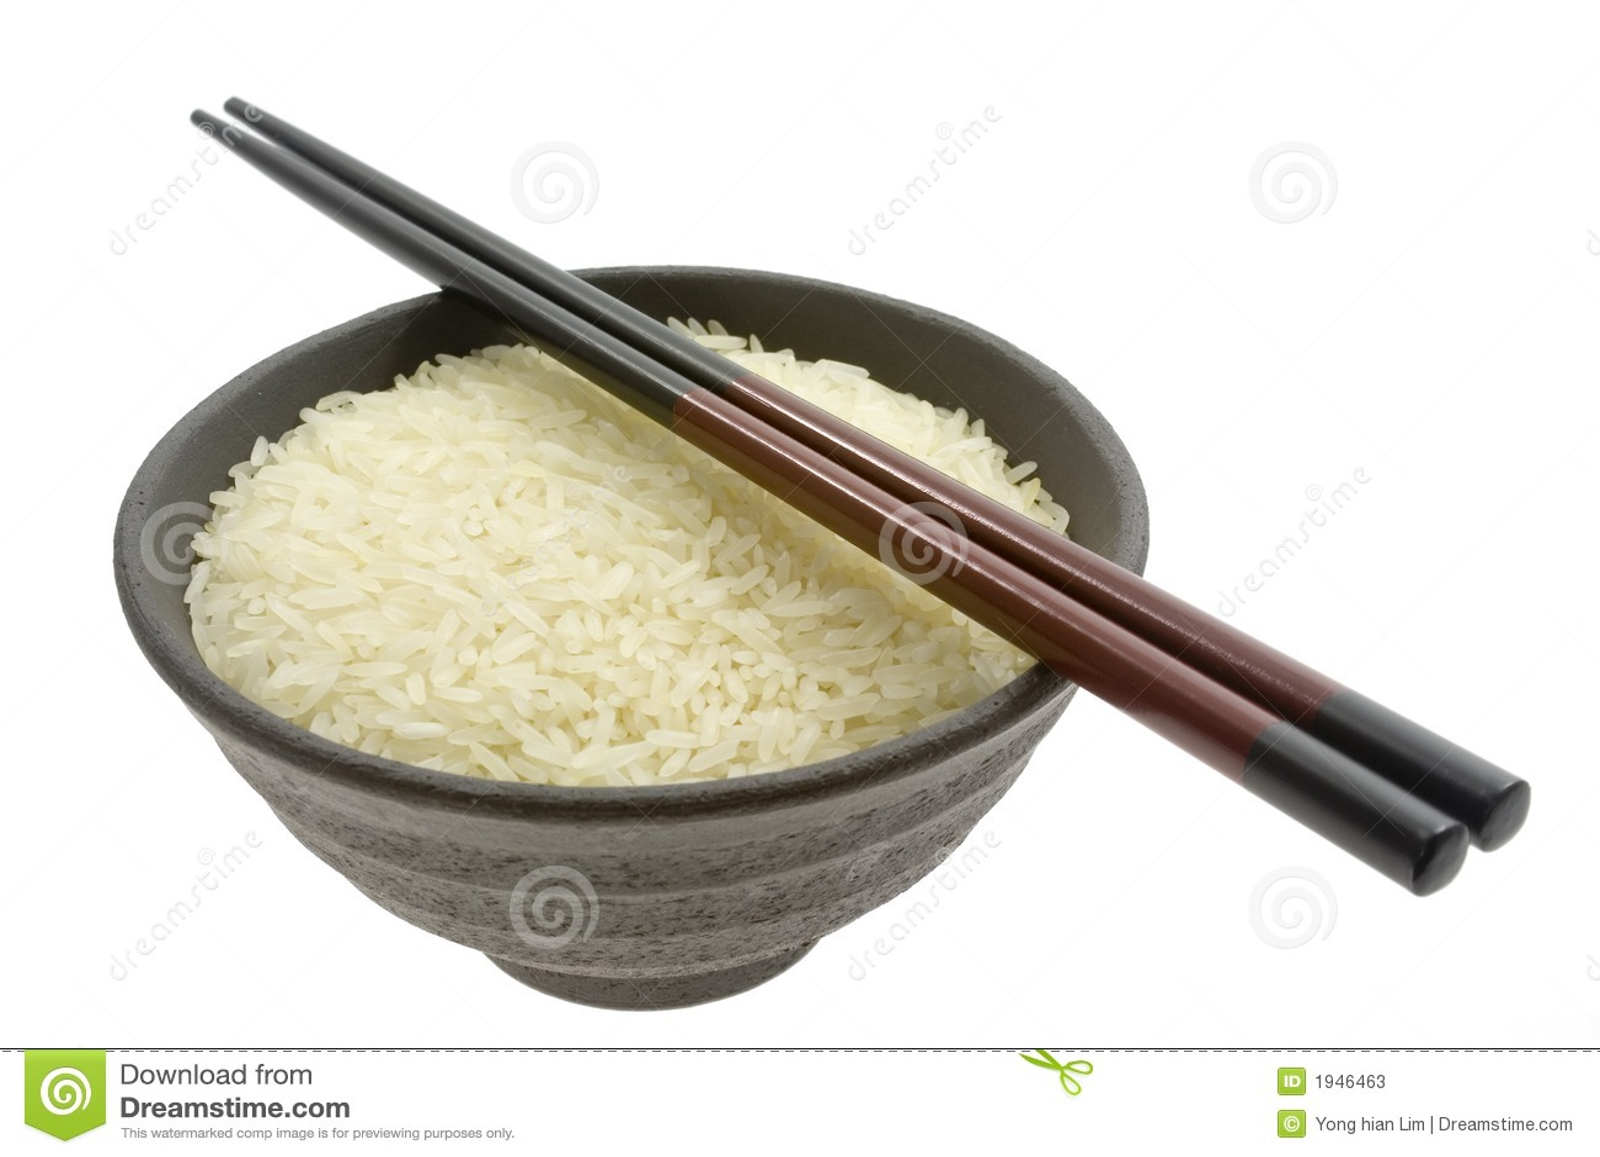 bowl of rice with chopsticks stock image image 1946463. Black Bedroom Furniture Sets. Home Design Ideas